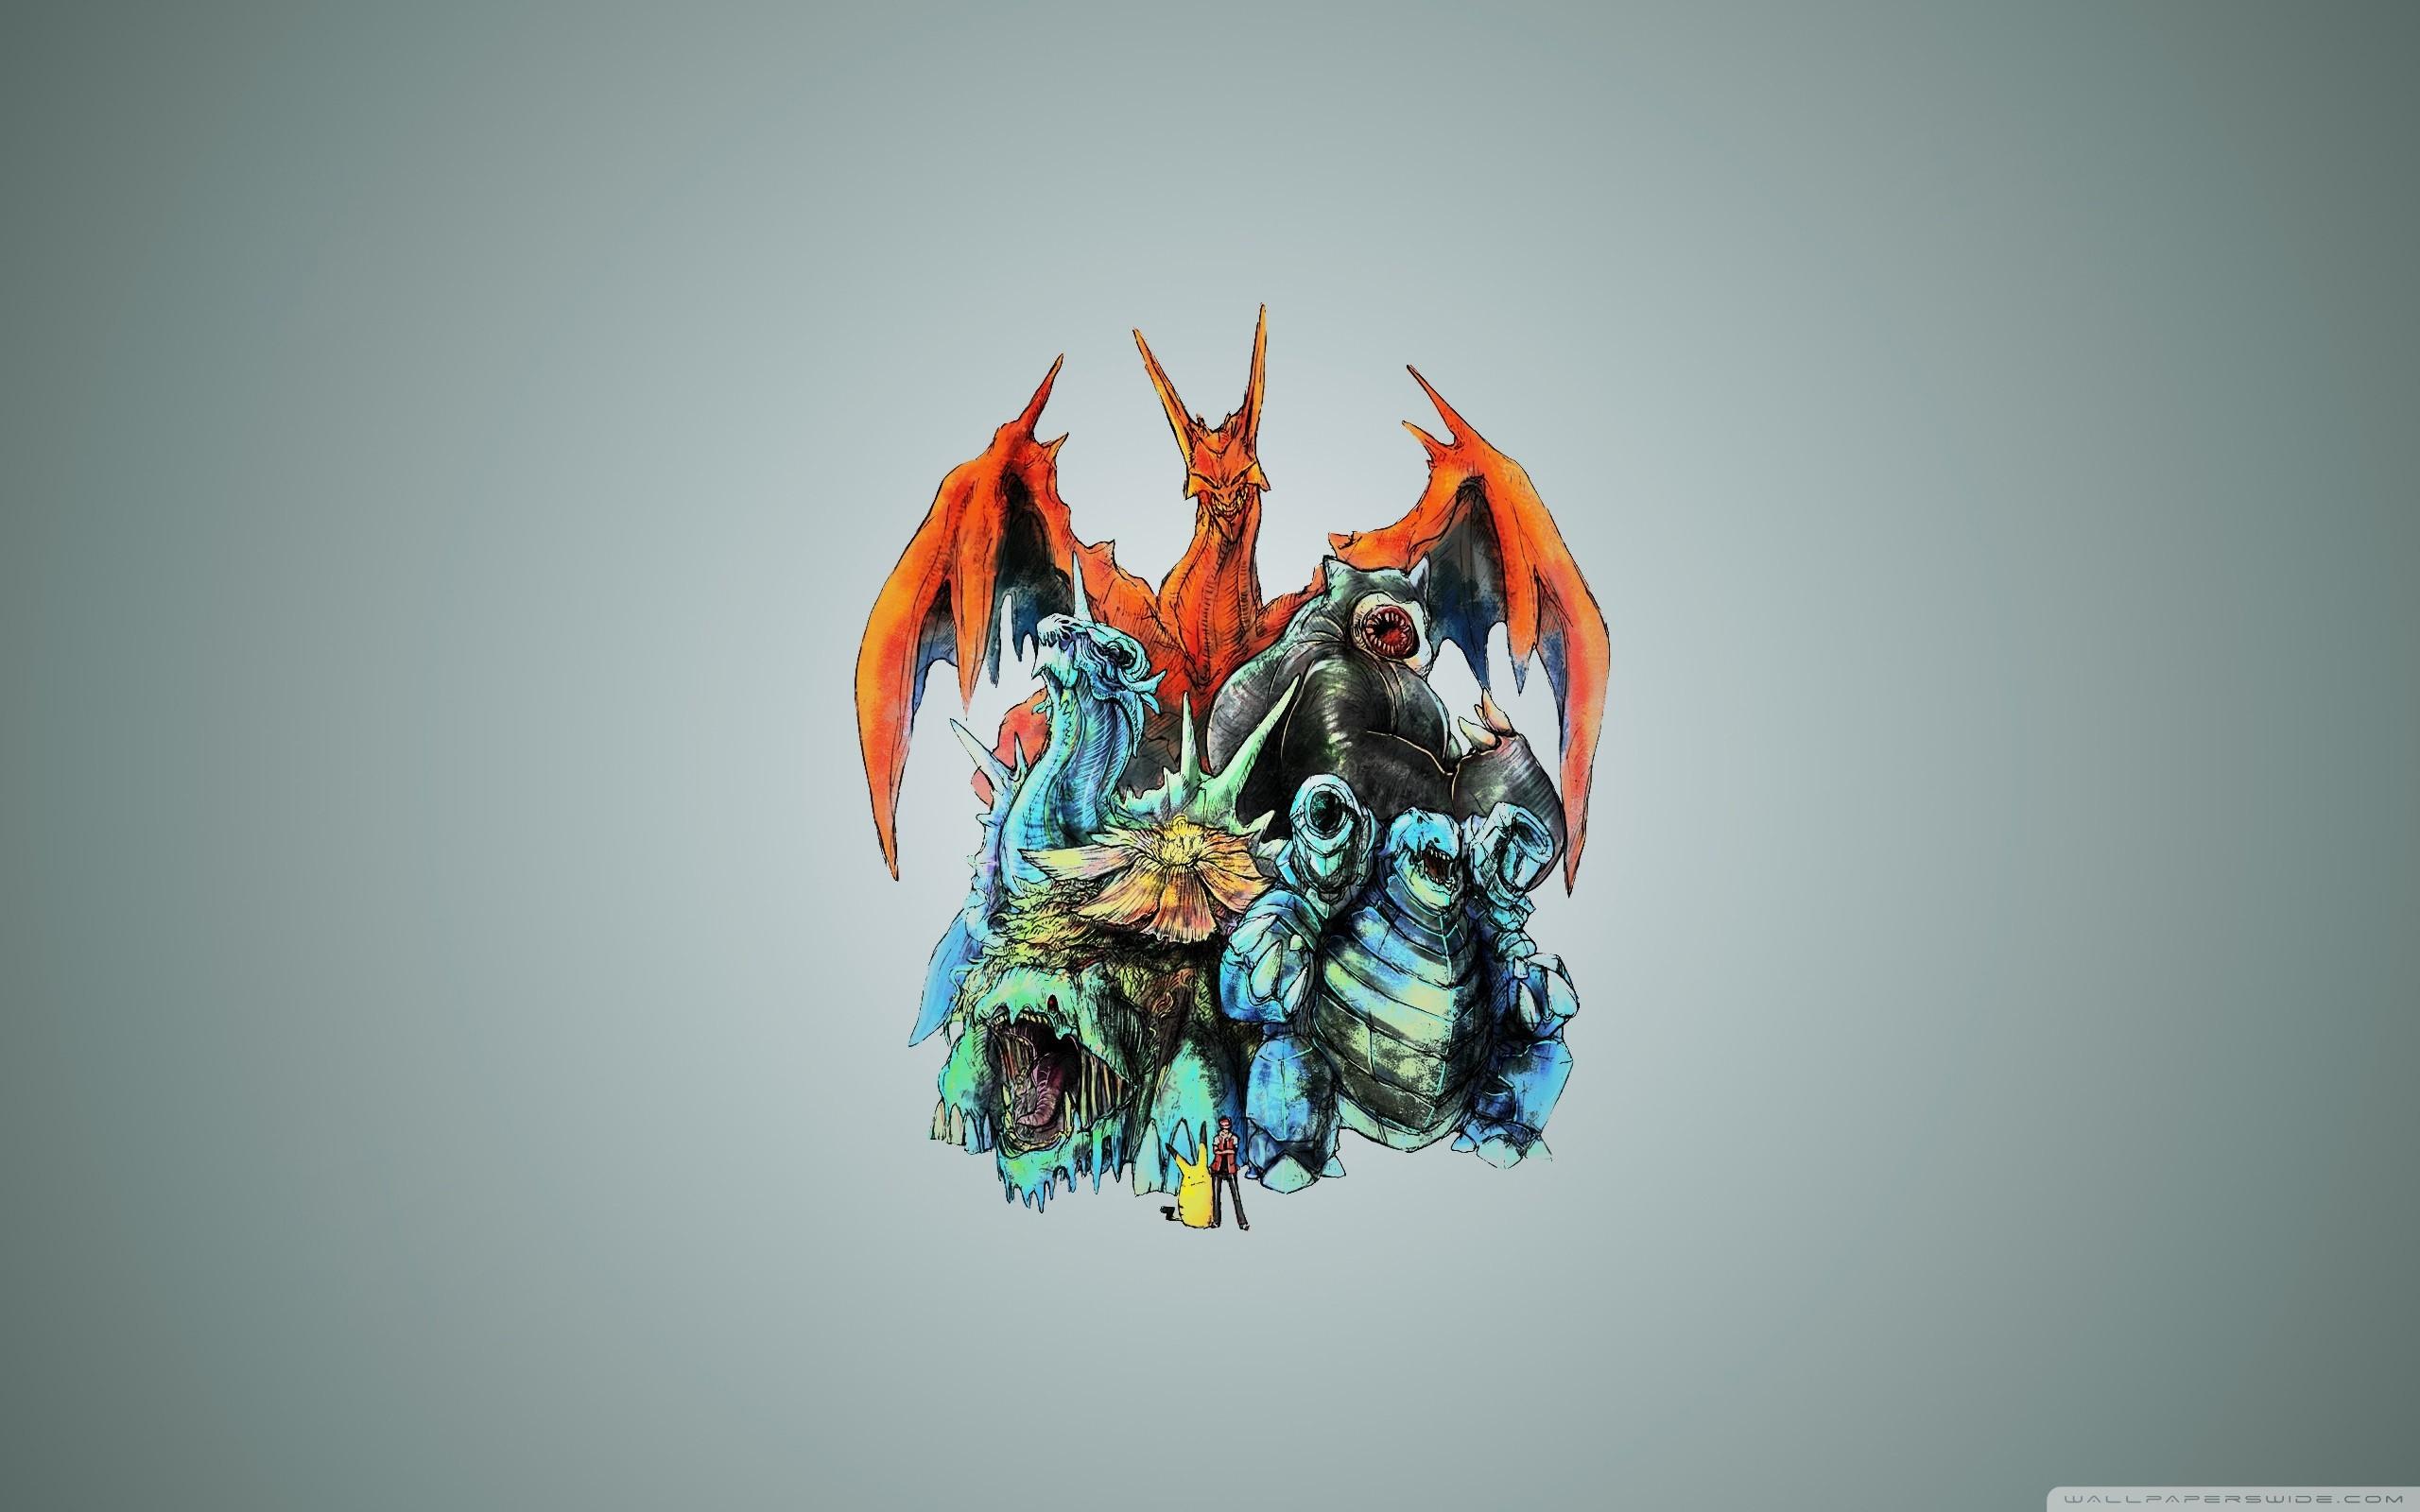 Pokemon Monsters HD Wide Wallpaper for Widescreen